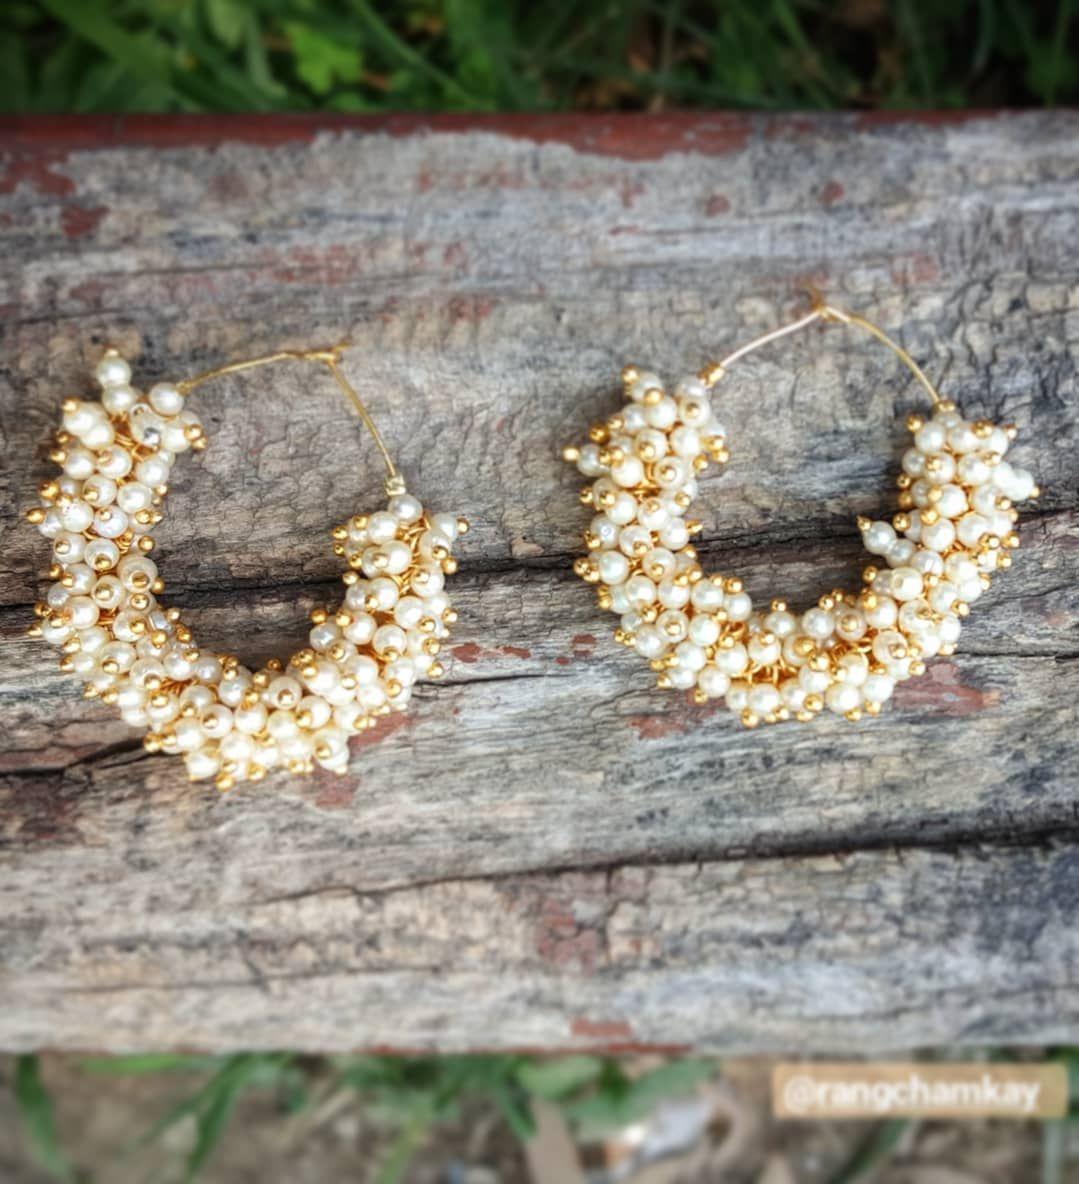 Pearl gajra bali is must have this season  Get yours now before in ends.  To order kindly dm  #pakistanstreetstyle #pakistani #pak #lahore #peshawar #quetta #boho #chic #perfectforthisseason #photography #photoshoot #nature #naturalphotography #instajewelry #instalove #tribaljewelry #ethnicjewelry #statementrangchamkay #Trendy #shaadi #weddingseason #summervibes  #karachites #casuallook        Trendy Trend Beauty Fashion